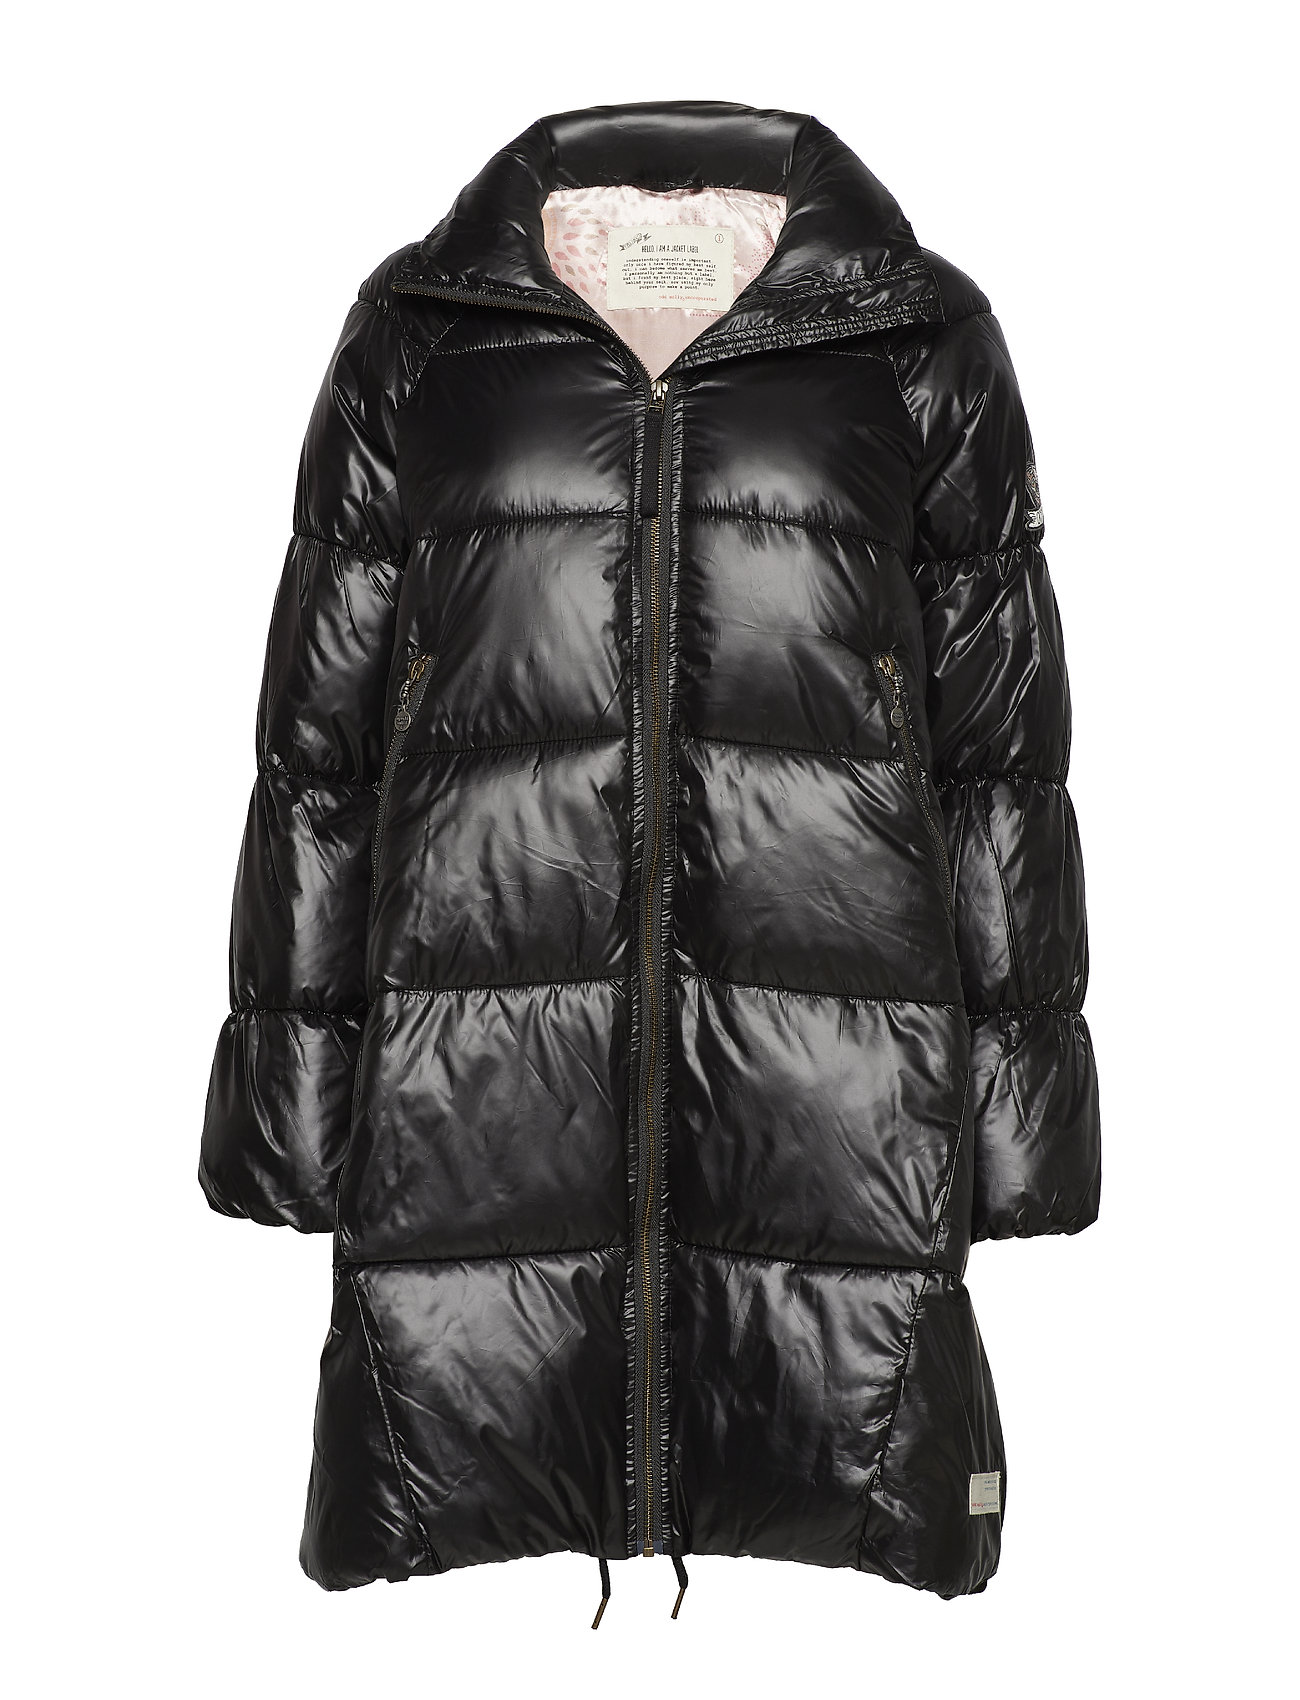 ODD MOLLY phenomenal jacket